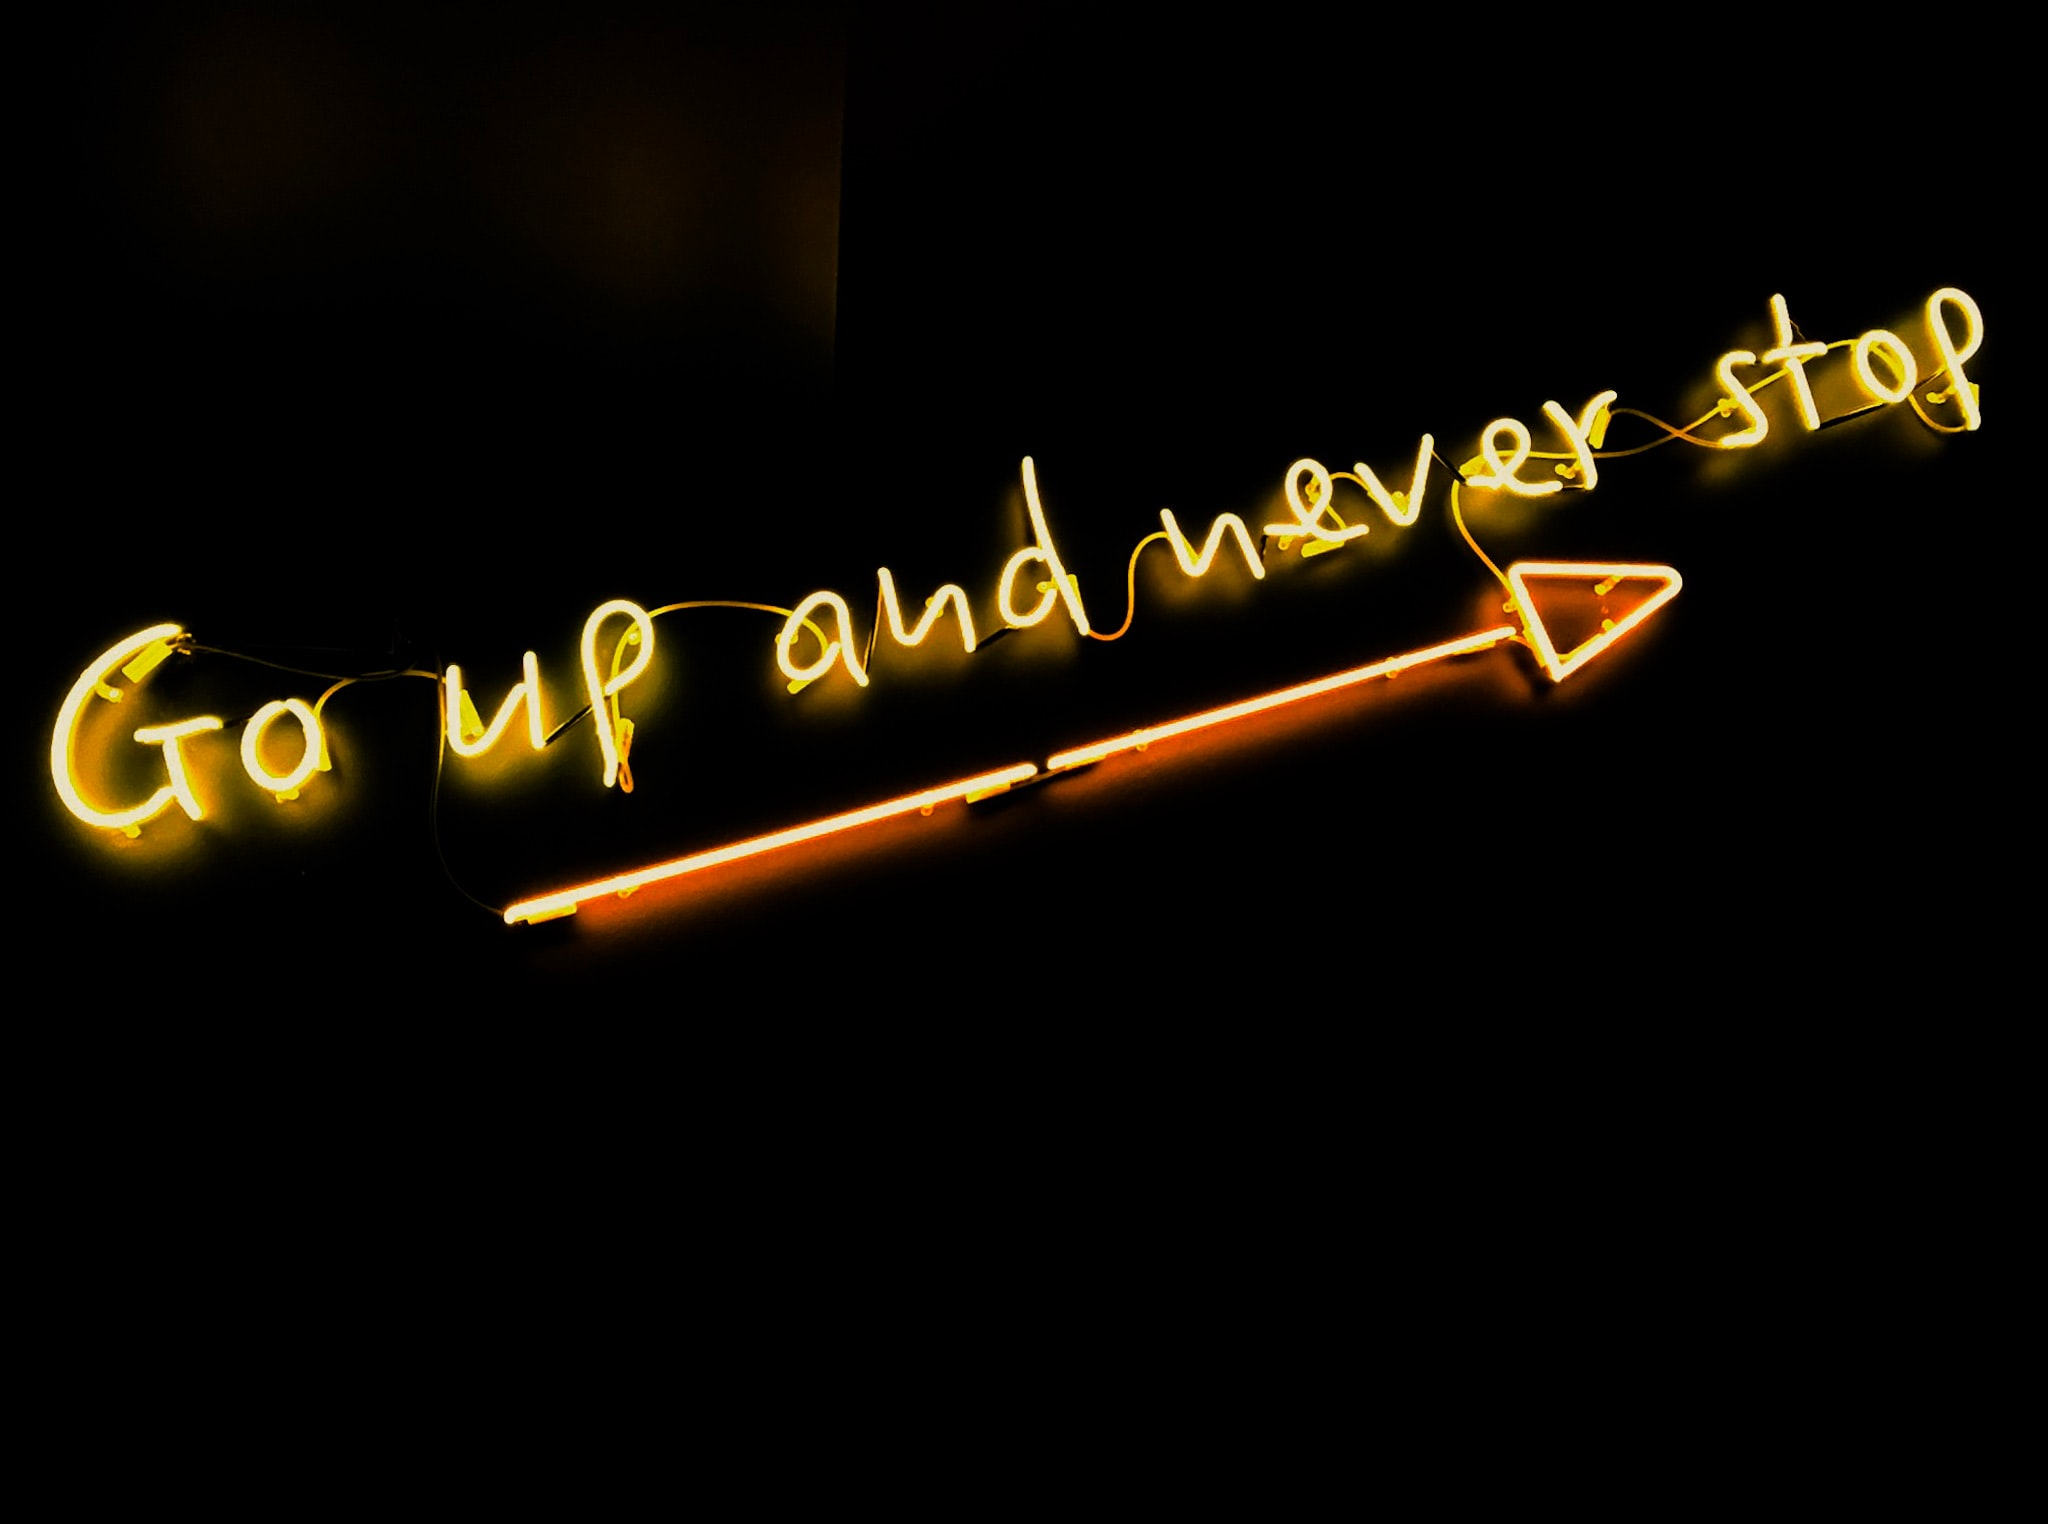 keep_going